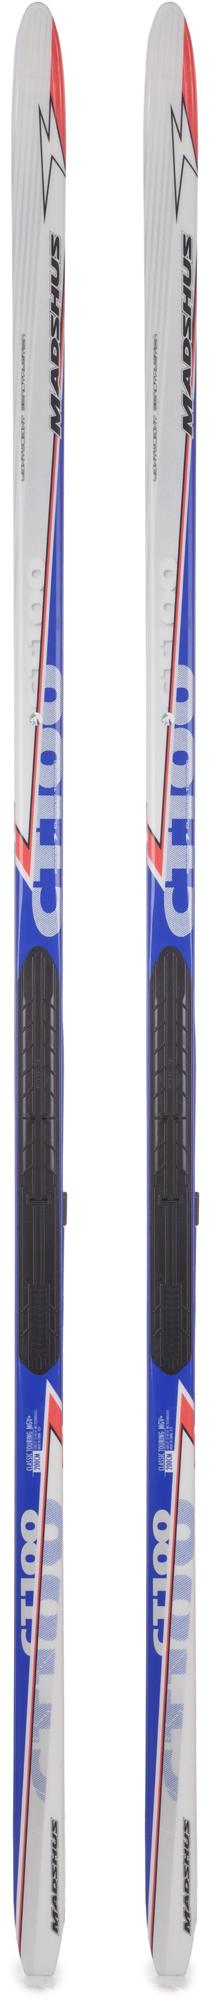 Madshus Беговые лыжи Madshus CT 100 MGV+ Skis XC sport генератор бензиновый masteryard mgv 1000r